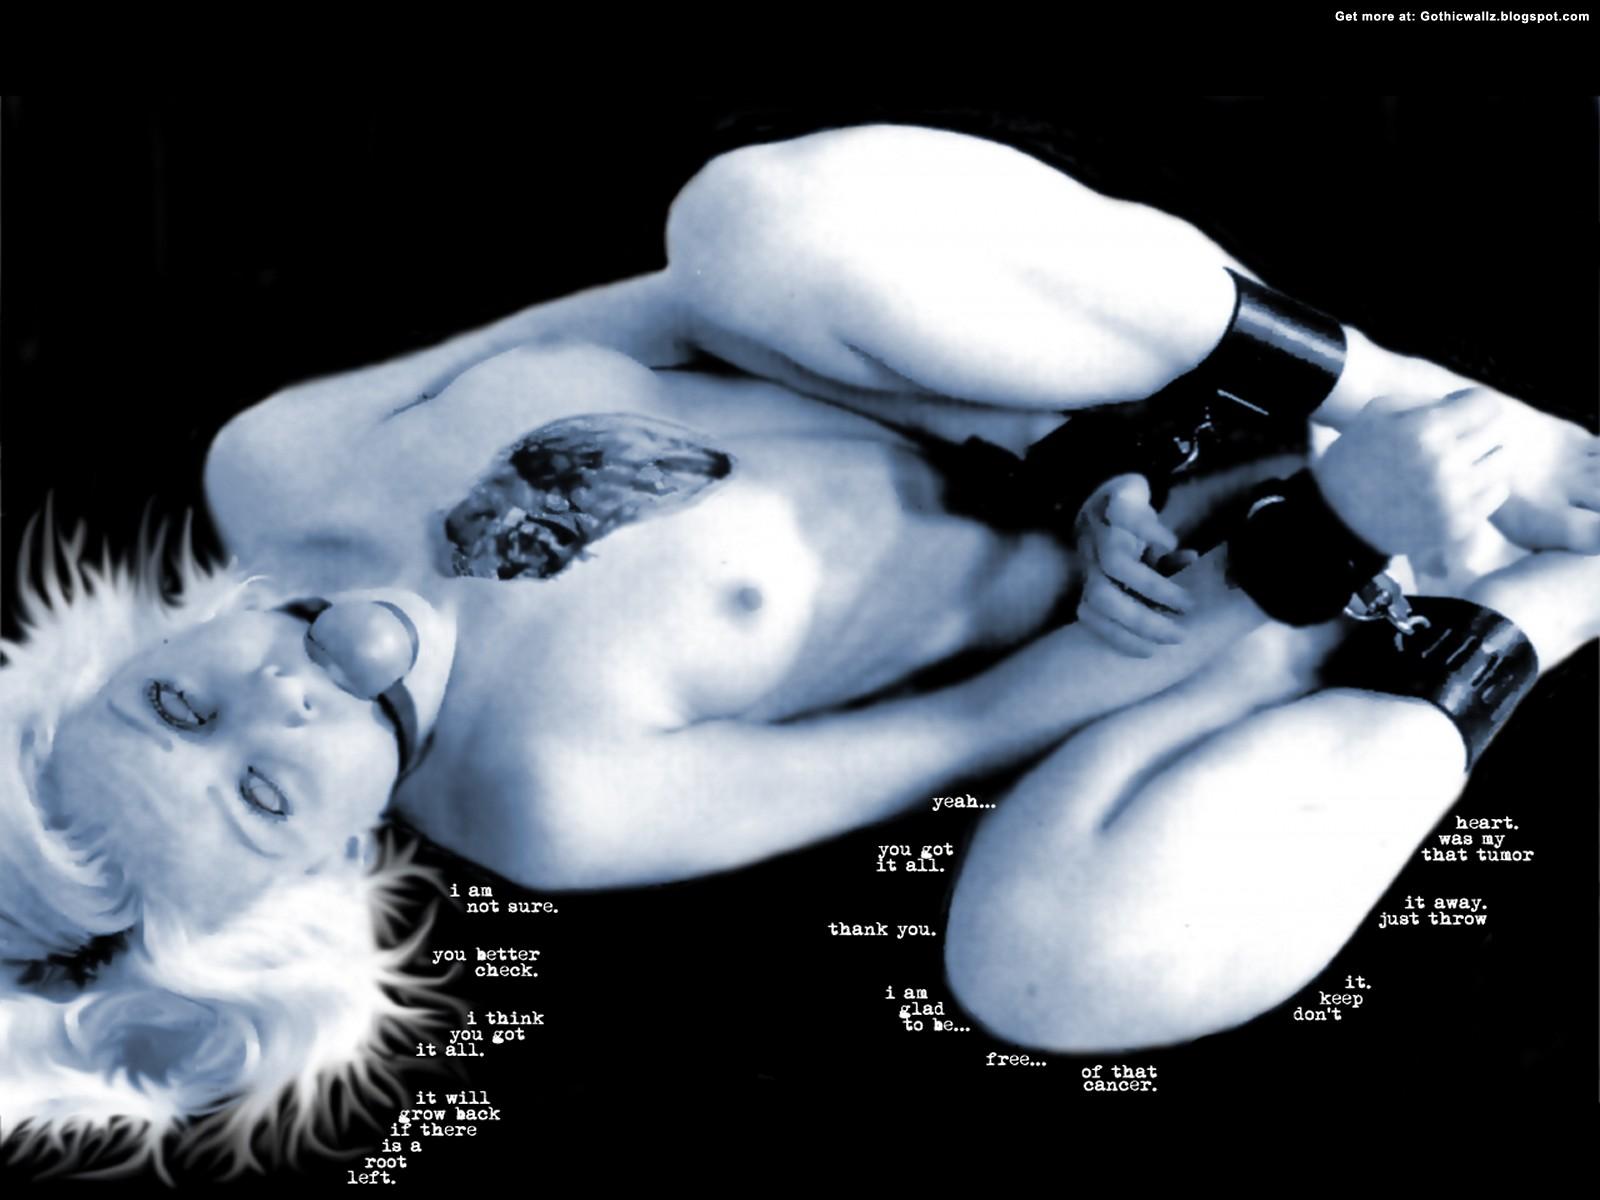 Fettered Girl | Gothic Wallpaper Download